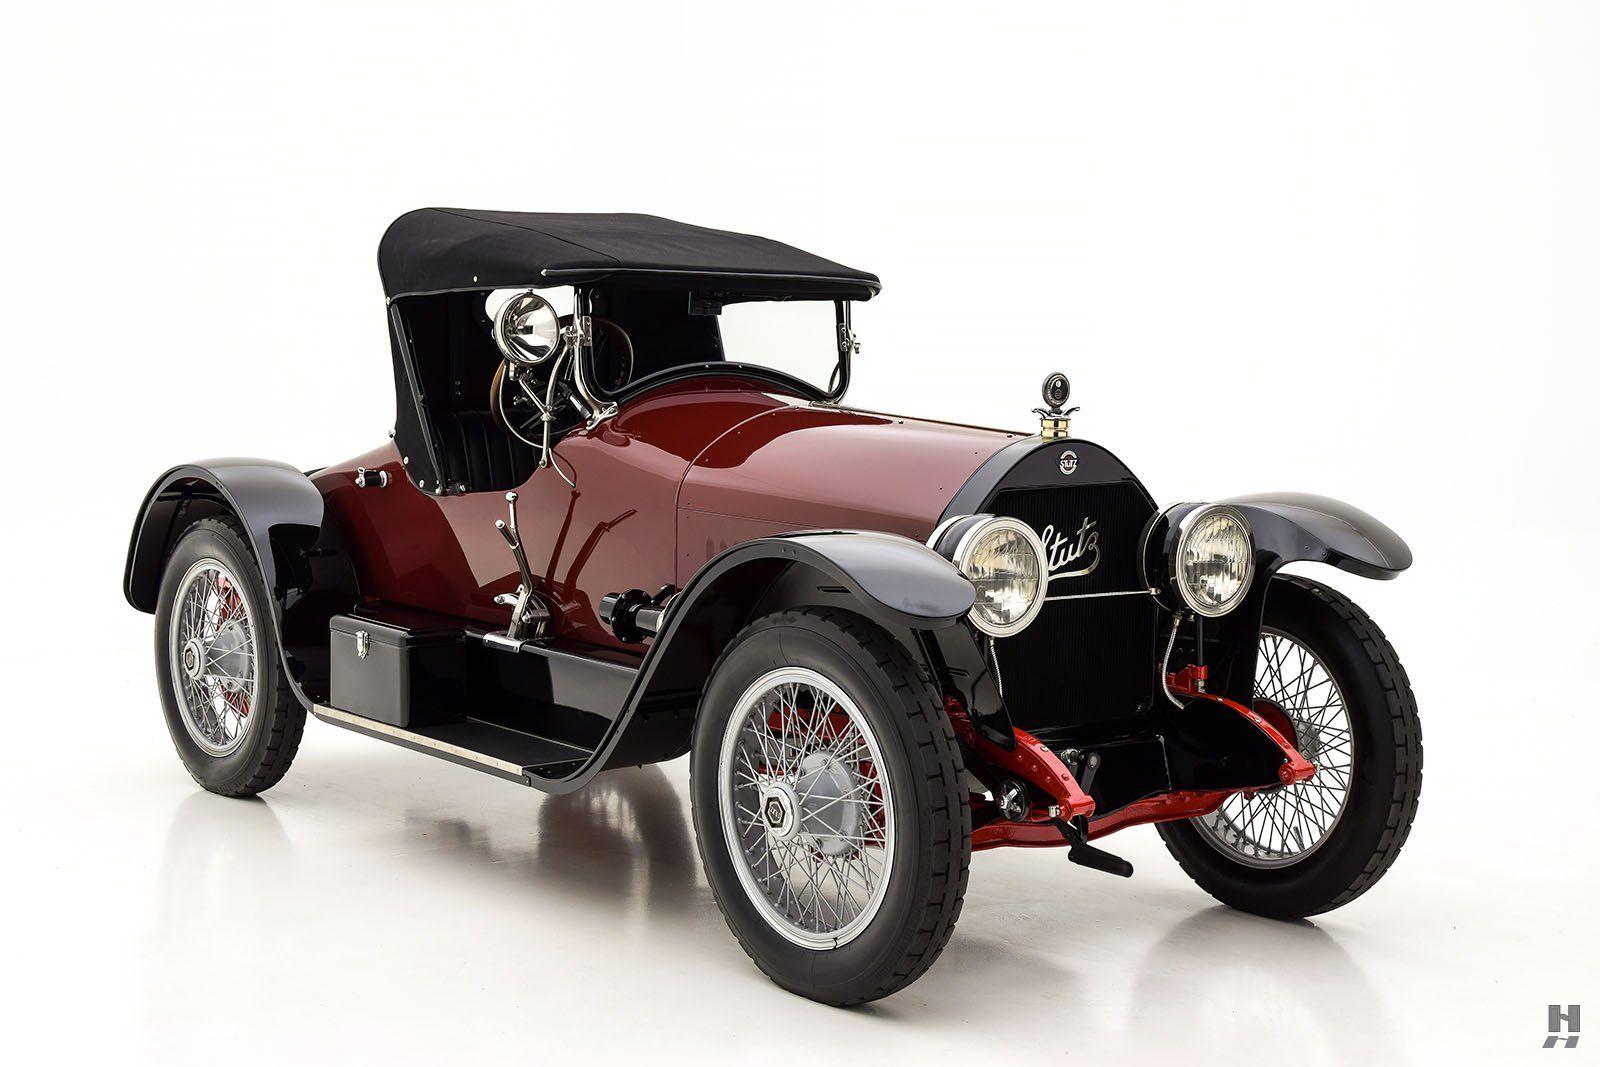 1920 Stutz Bearcat Classic Cars Vintage Antique Cars Sports Cars